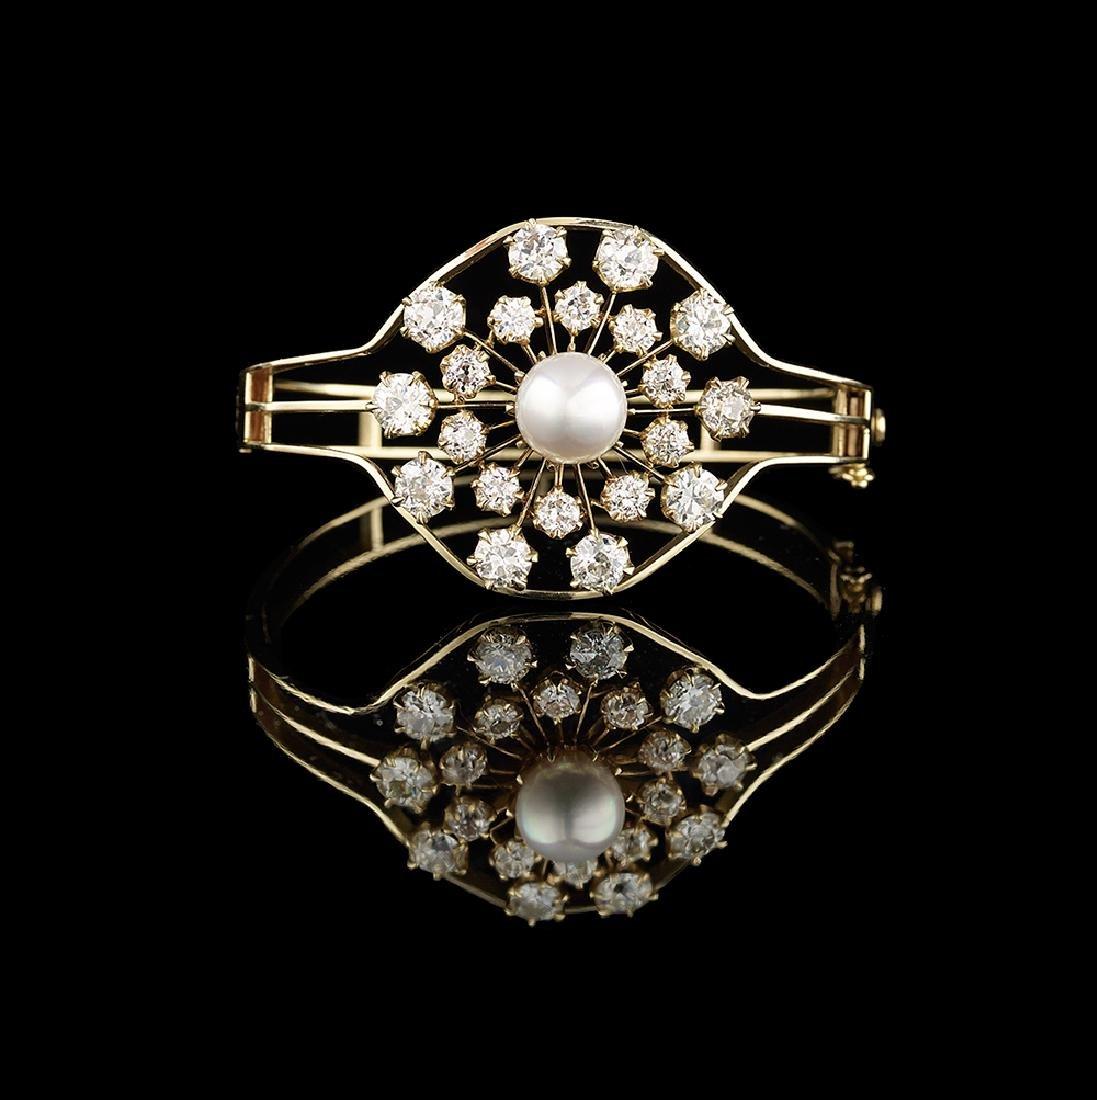 Custom-Made Diamond and Pearl Bangle Bracelet